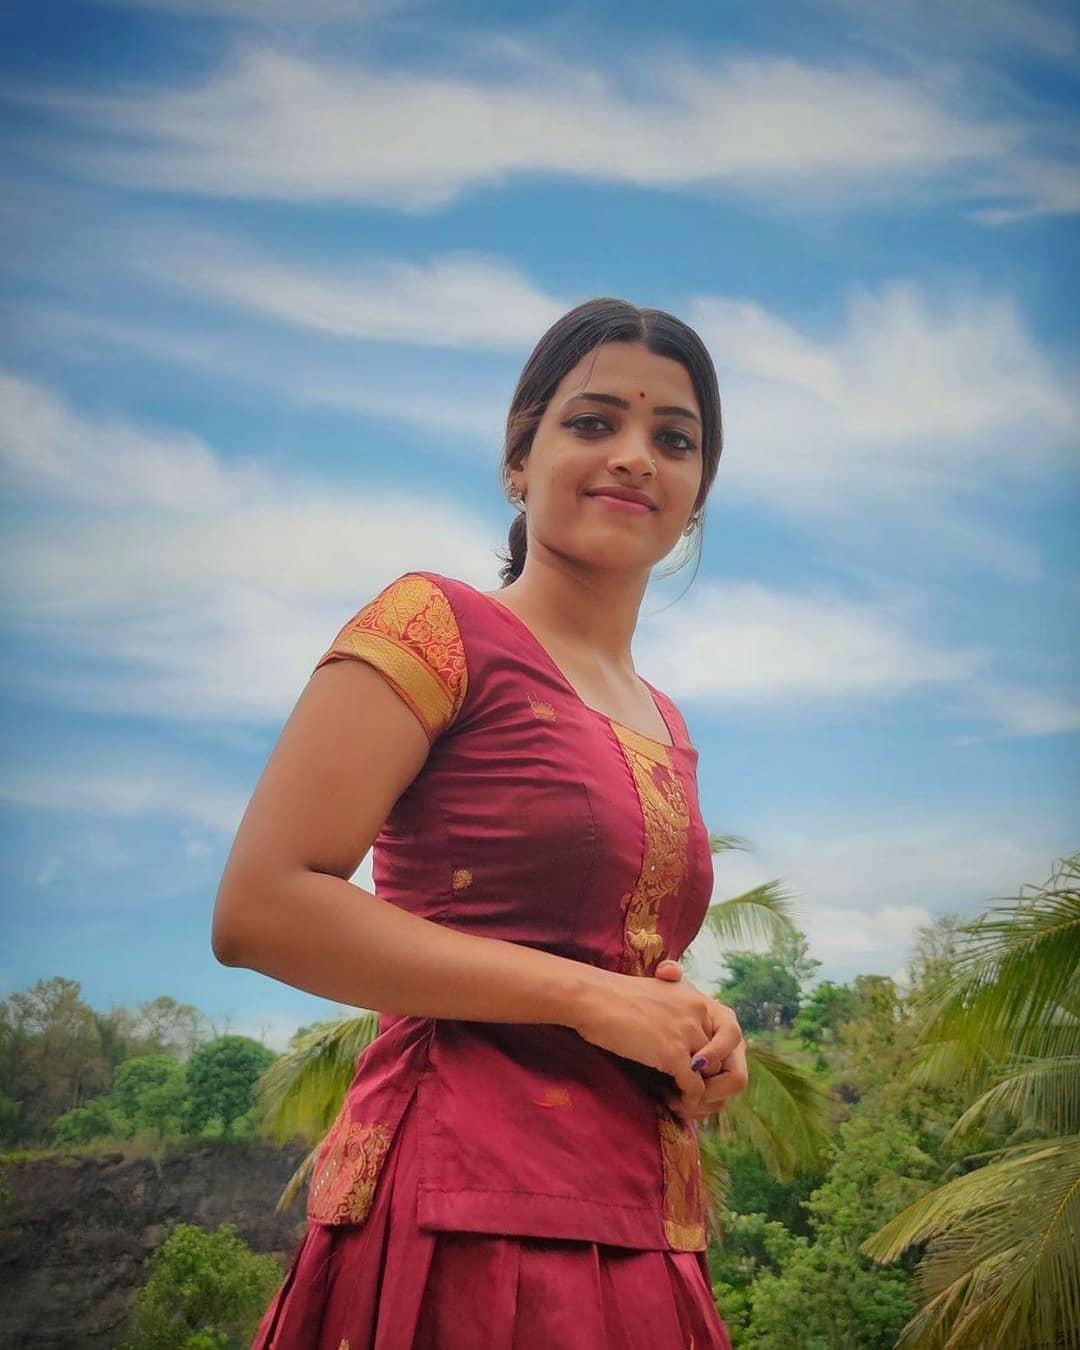 aishwarya rai look alike ammu